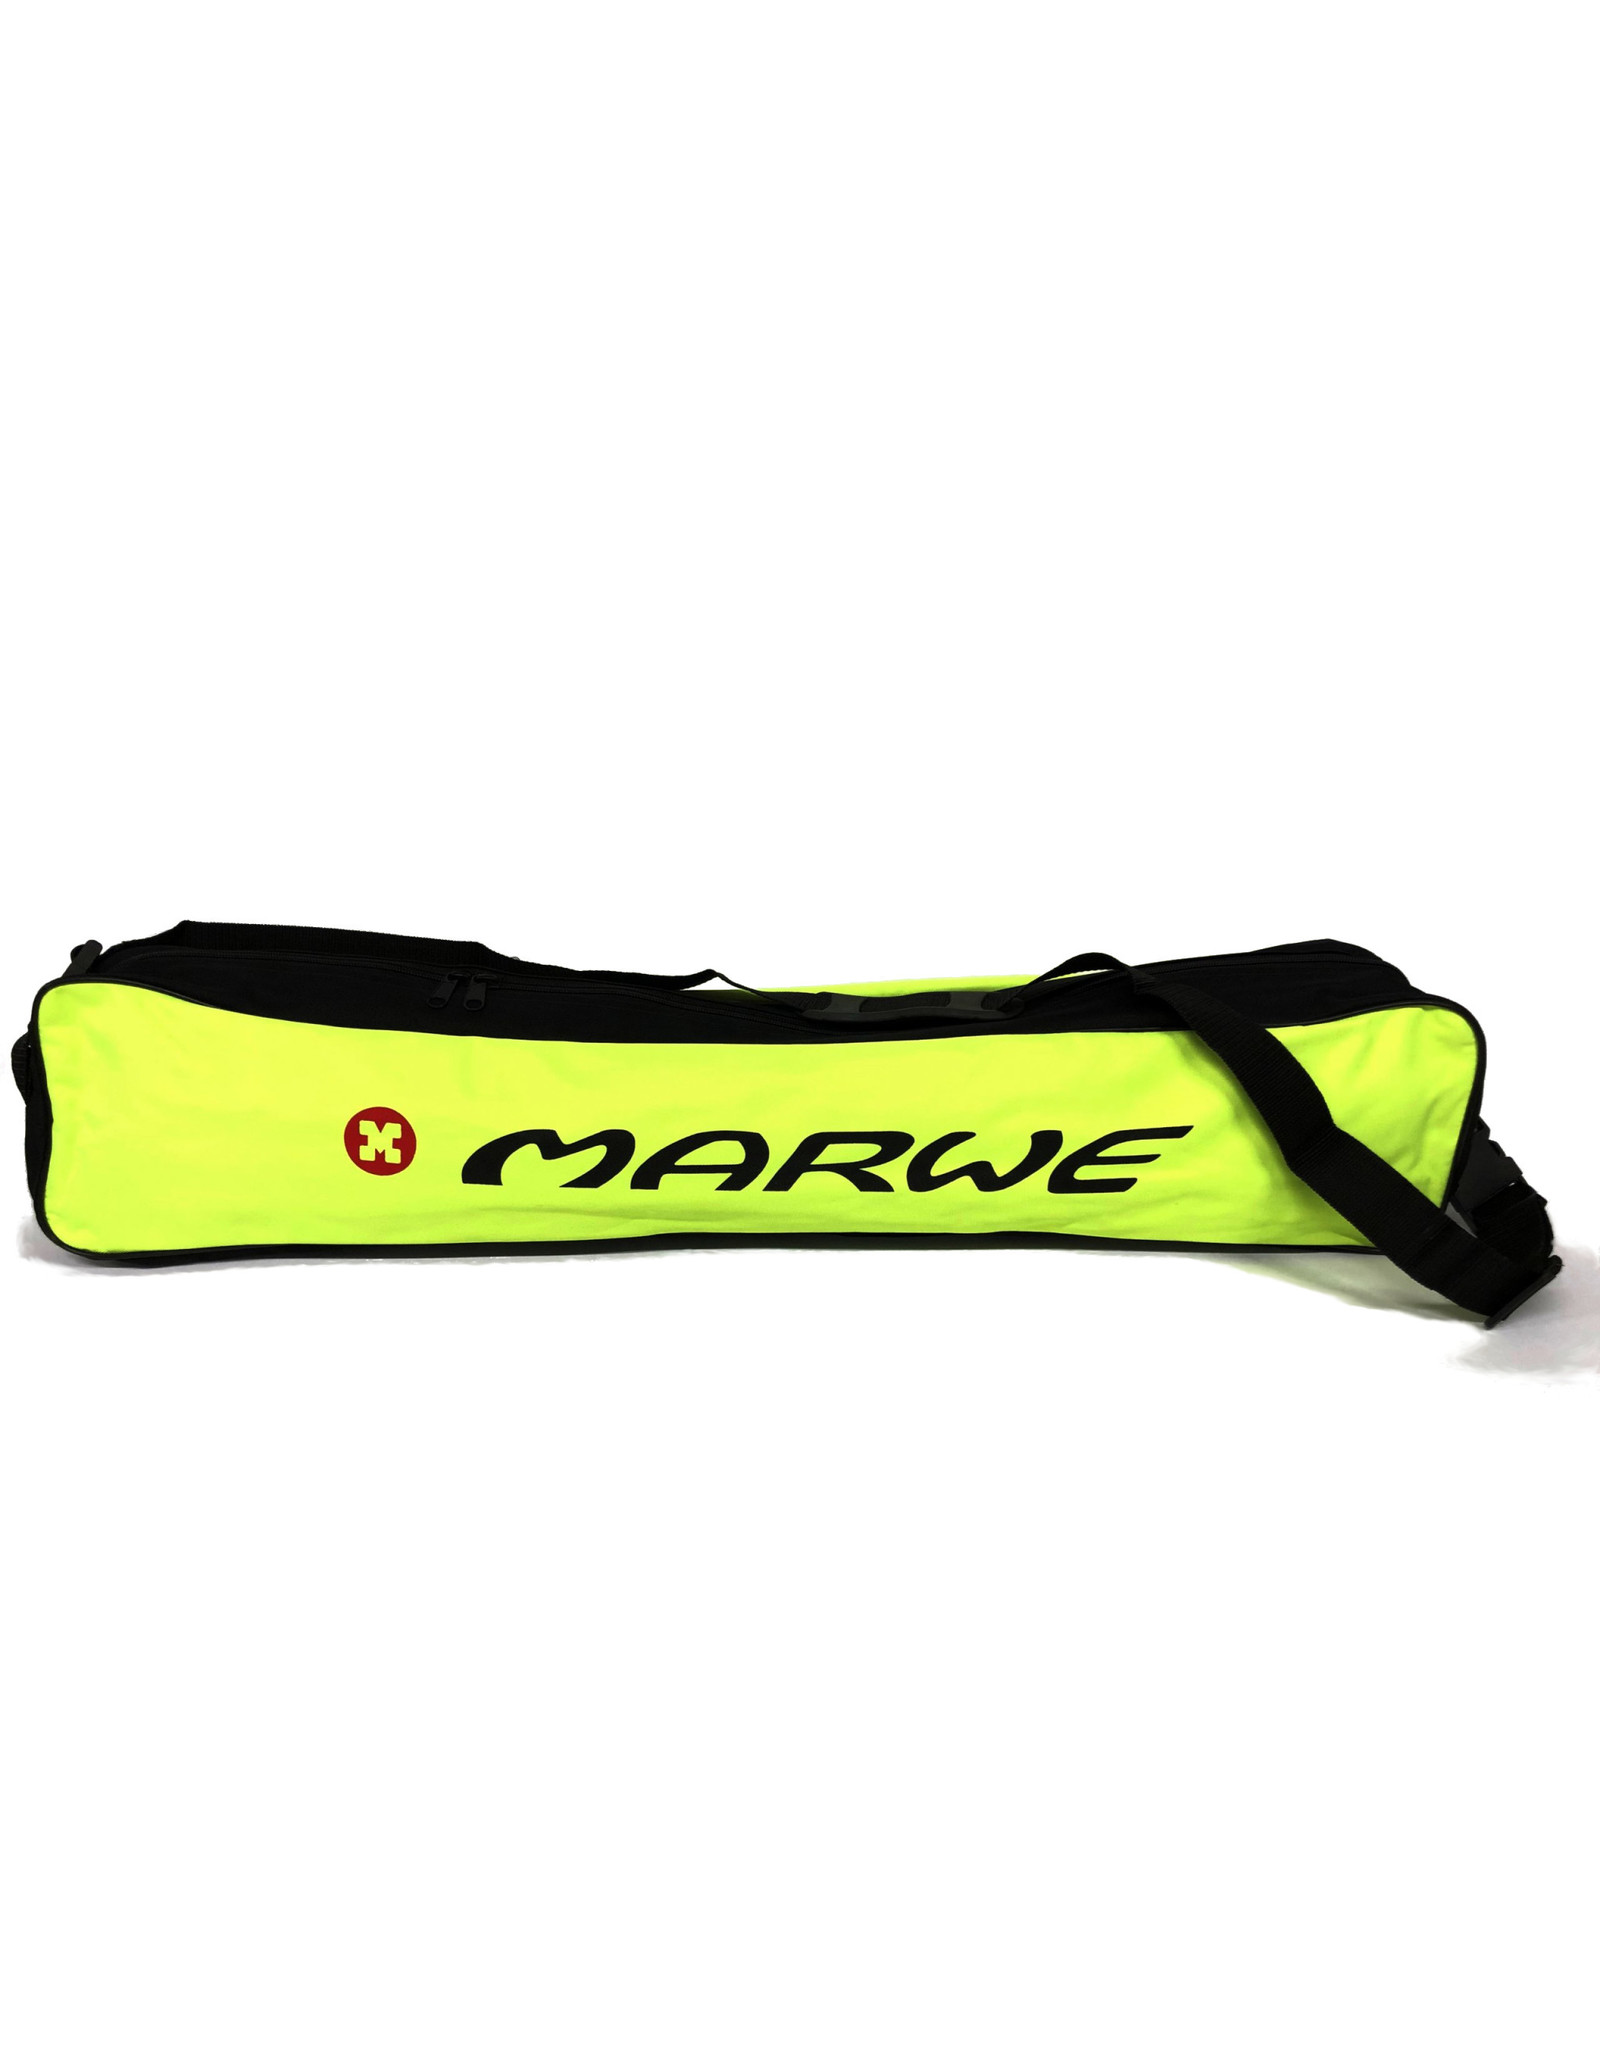 Marwe Marwe Roller Ski Bag